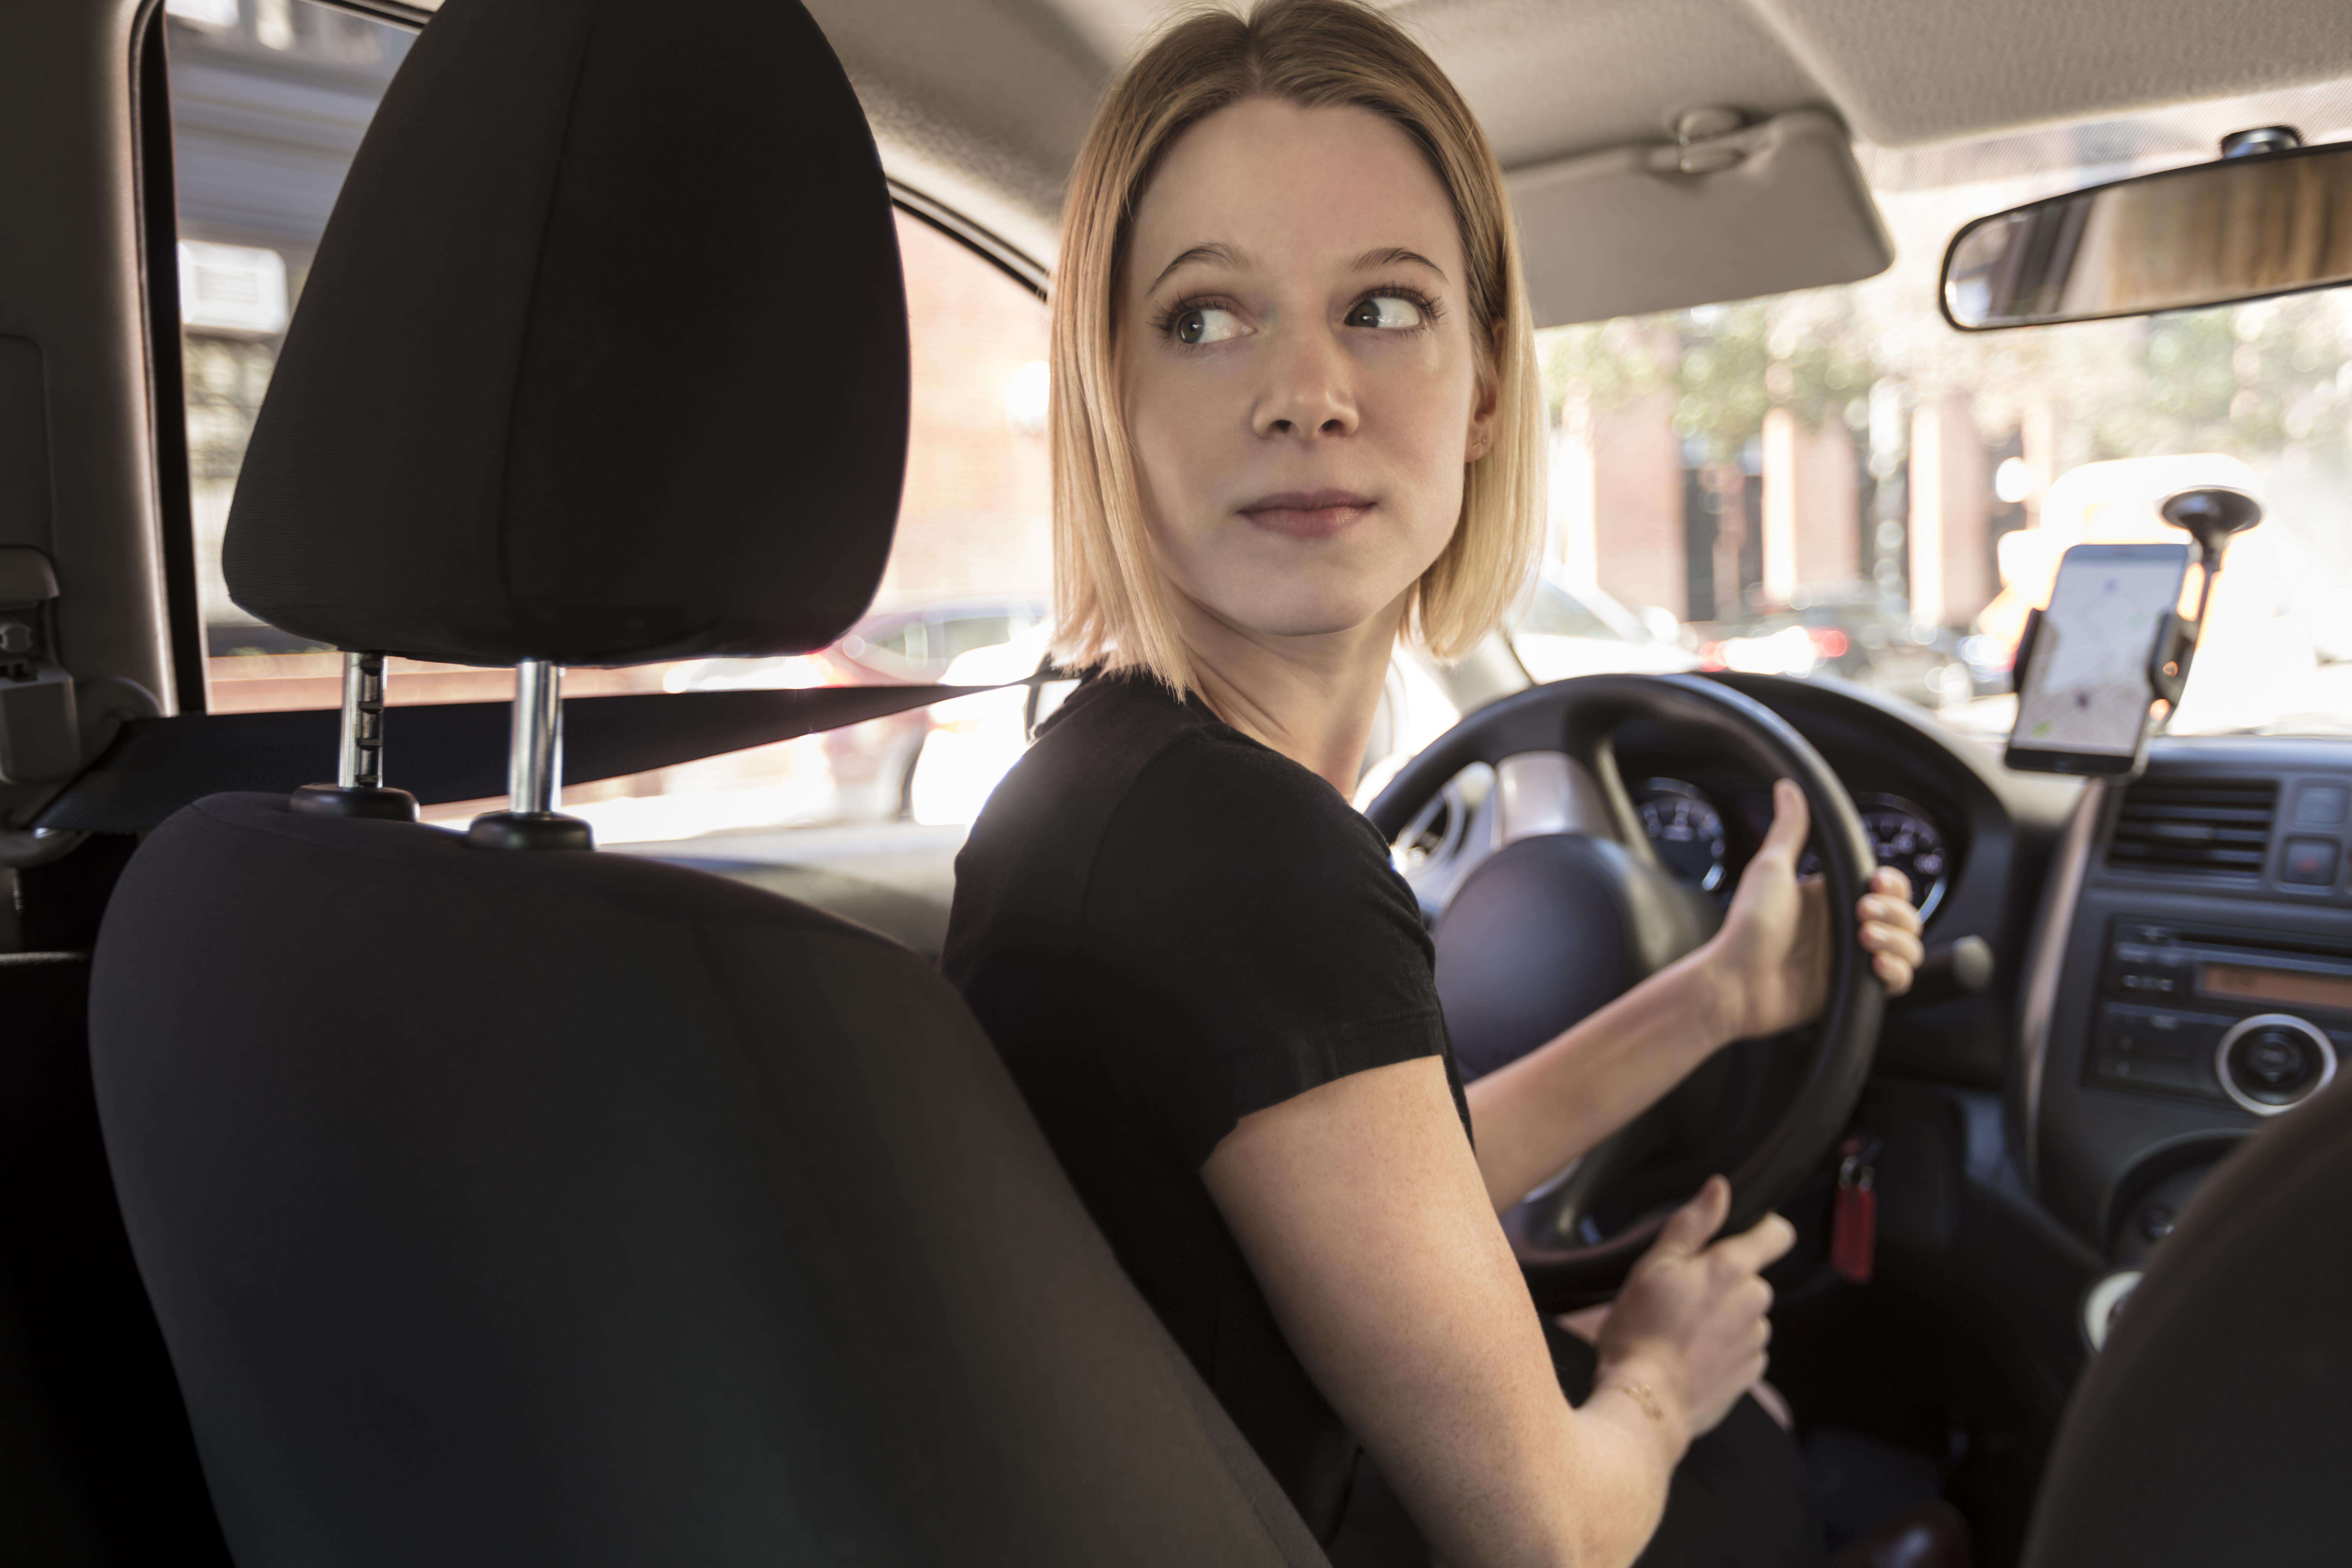 female uber drivers earn less